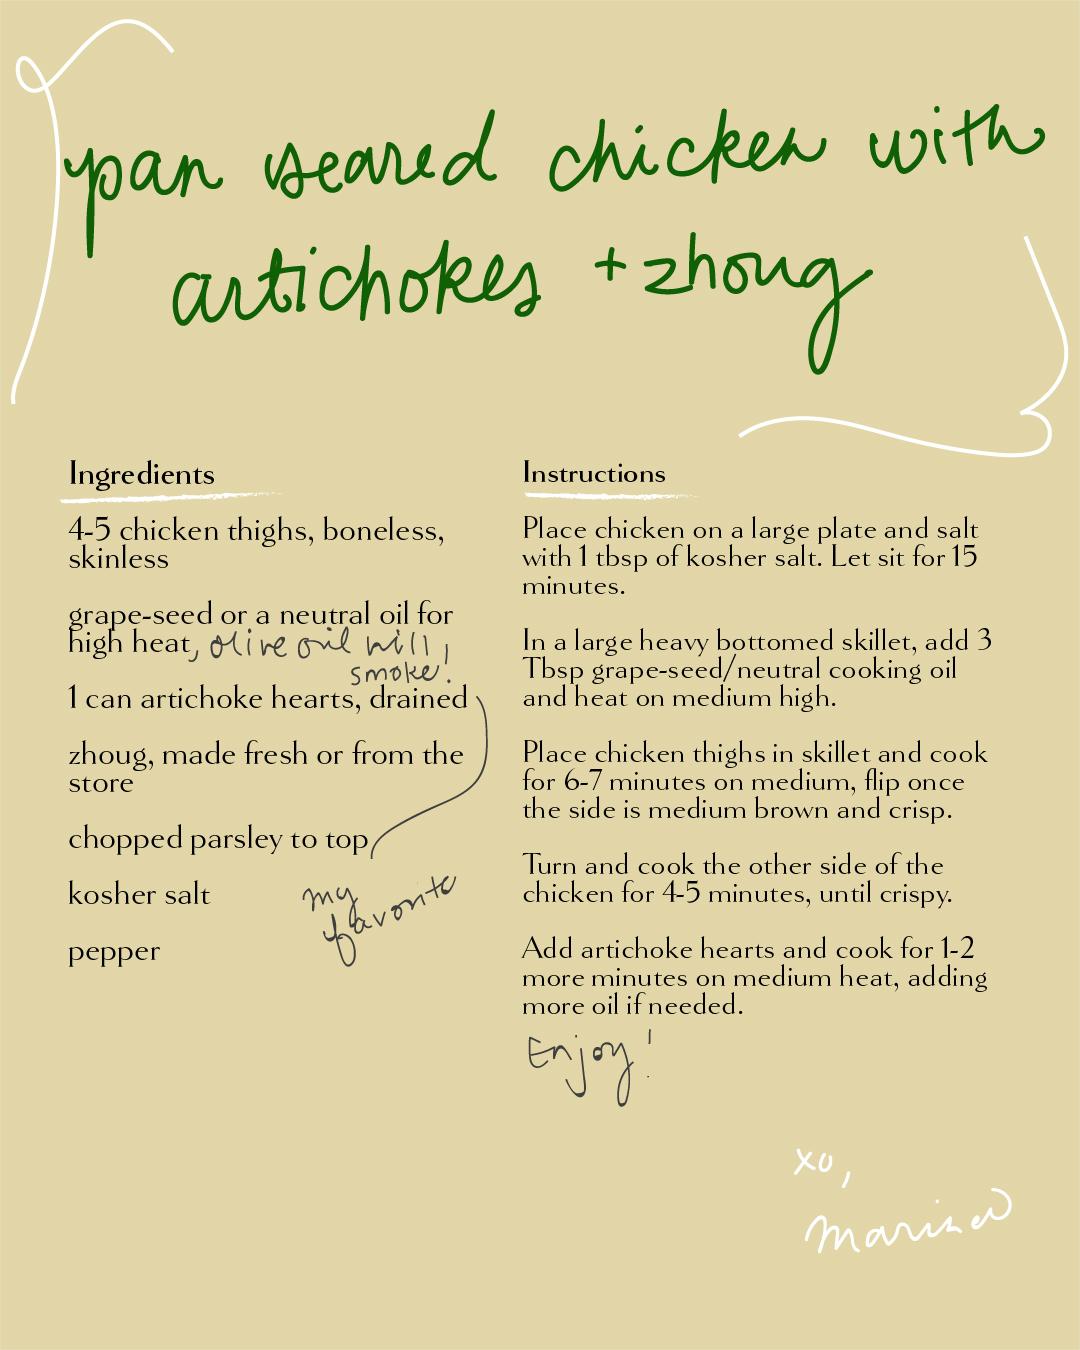 pan-seared chicken with artichokes and zhoug | marina gunn martin